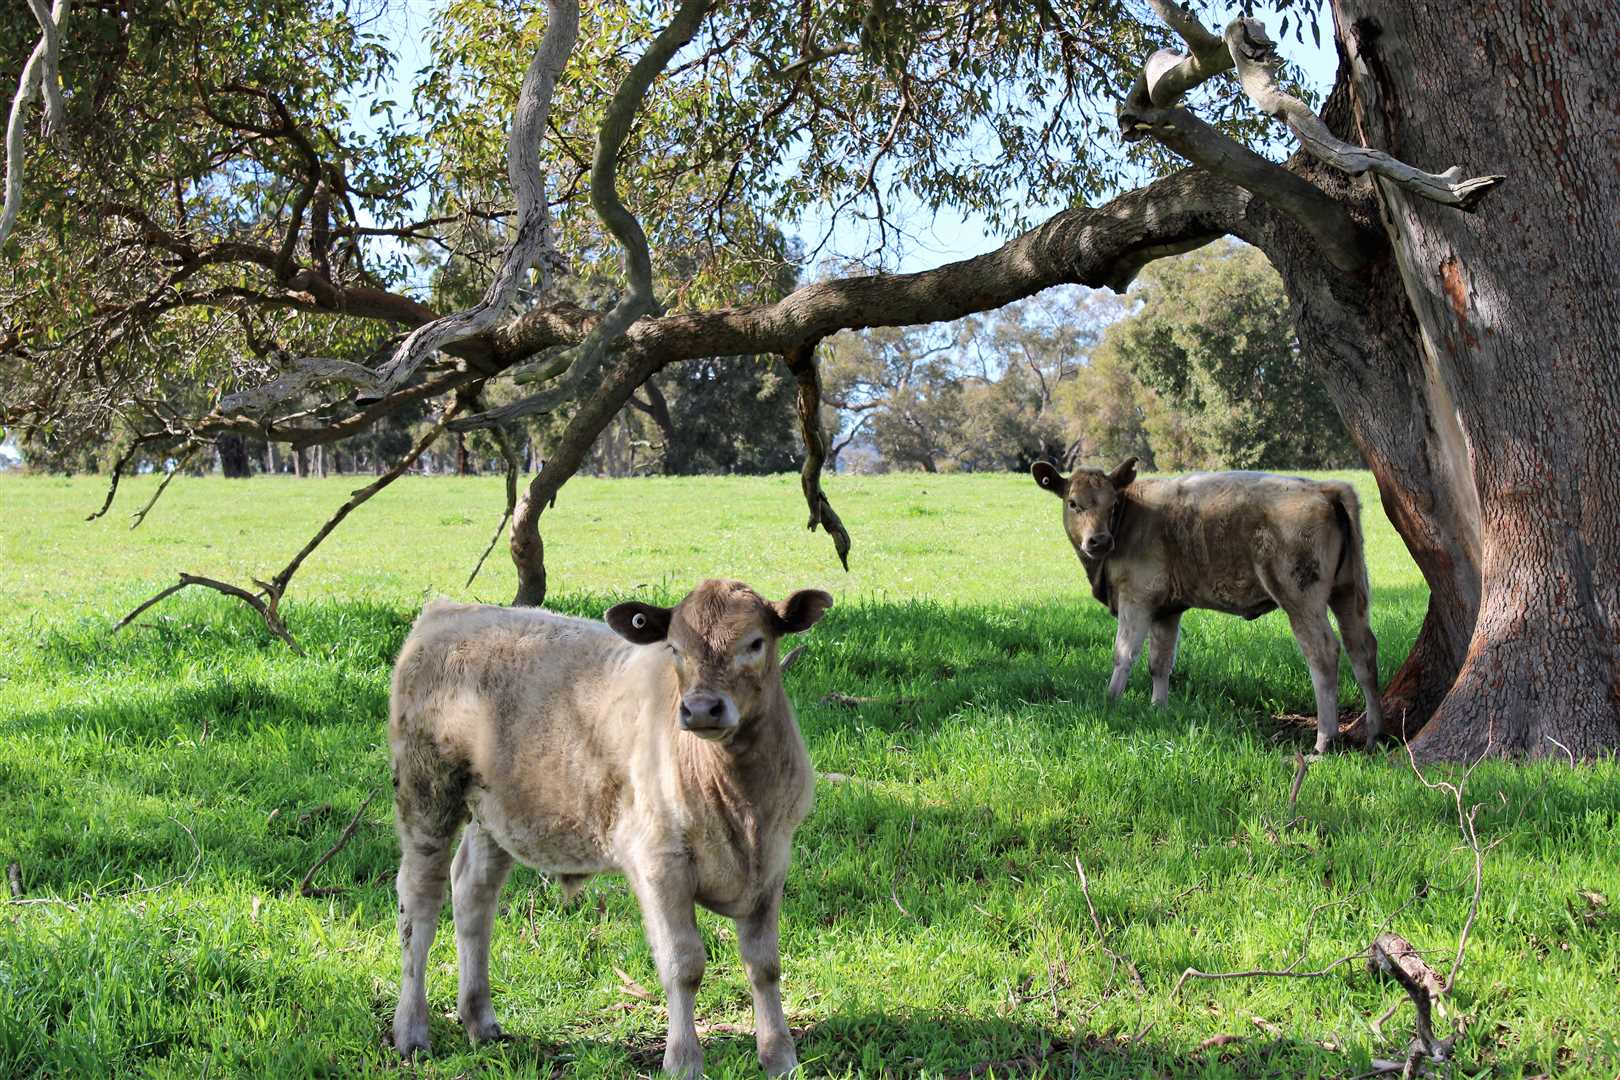 Calves at foot having some fun